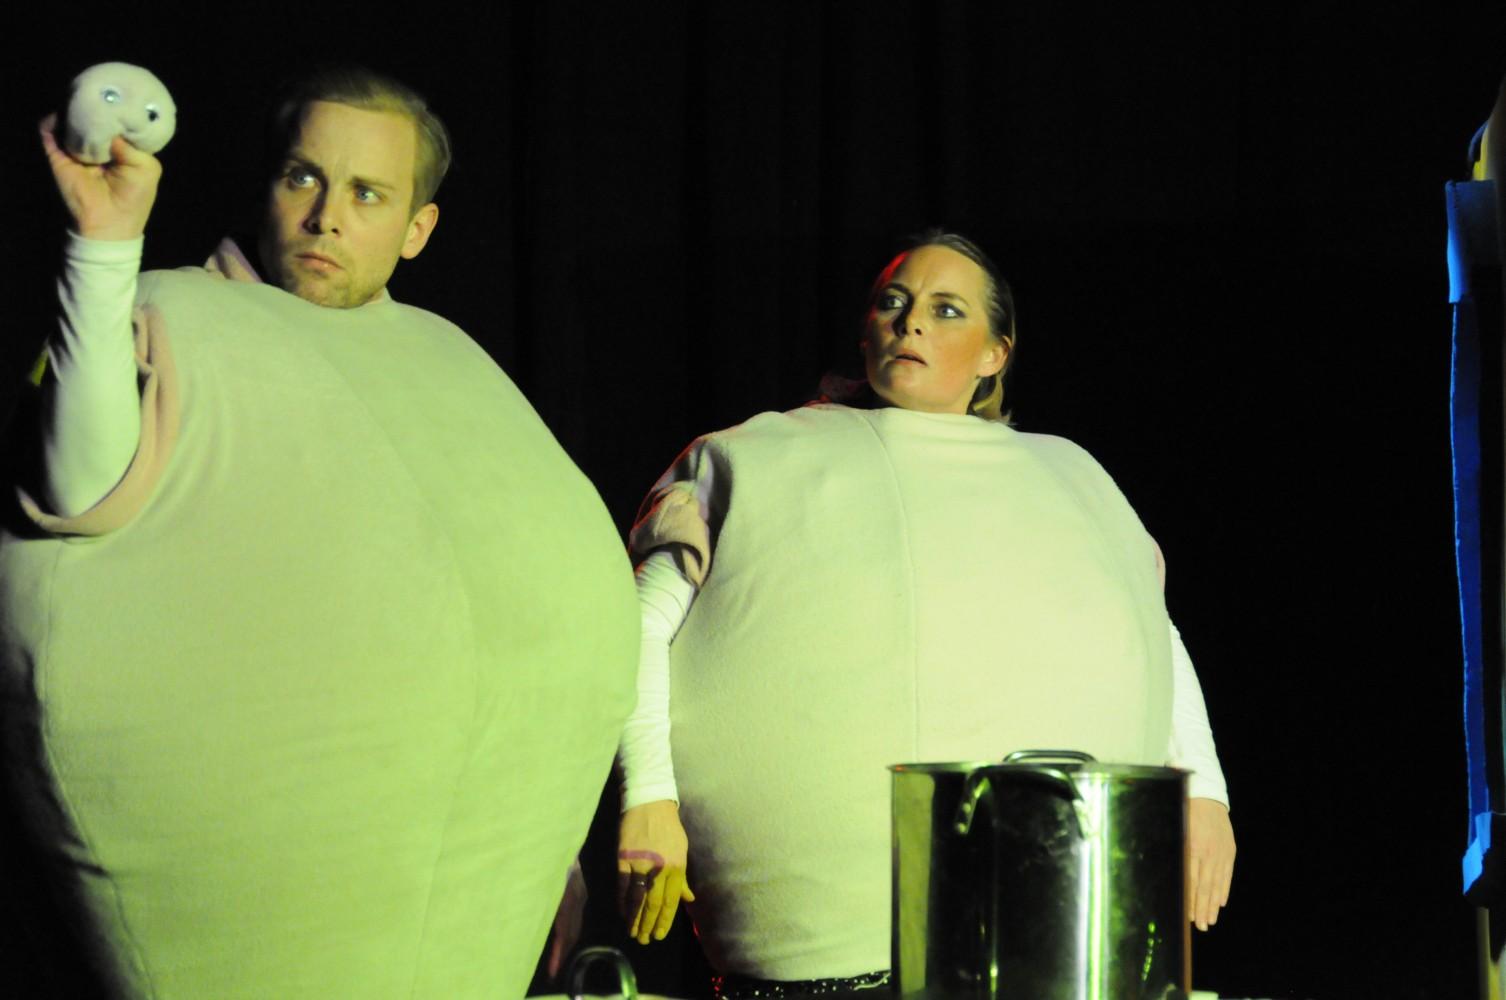 To personer på scenen i kledd som komper. Foto.